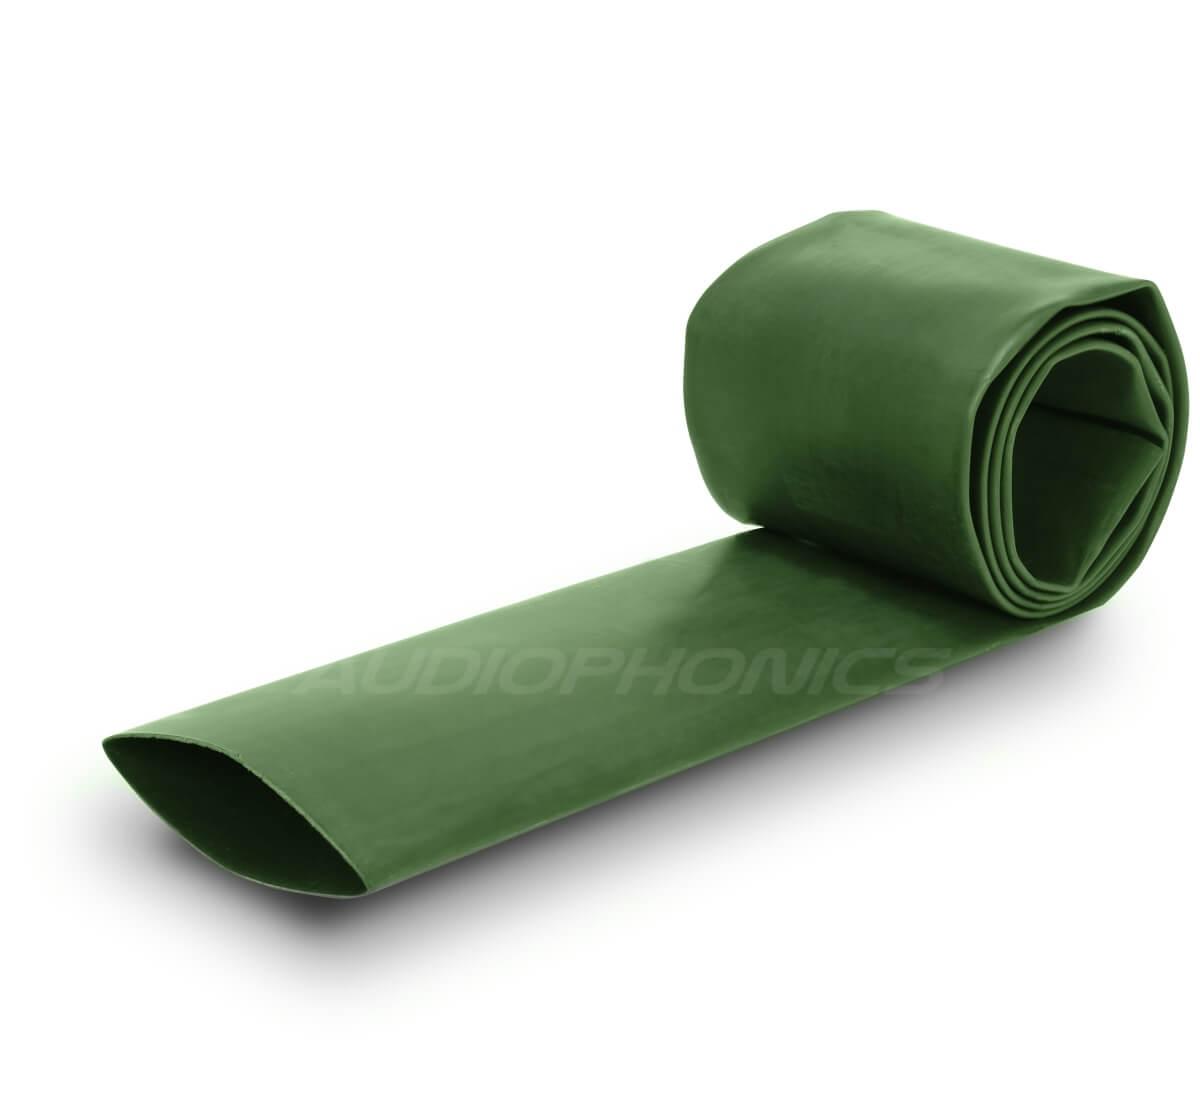 Heatshrink tube 2:1 Ø5mm Length 1m Green